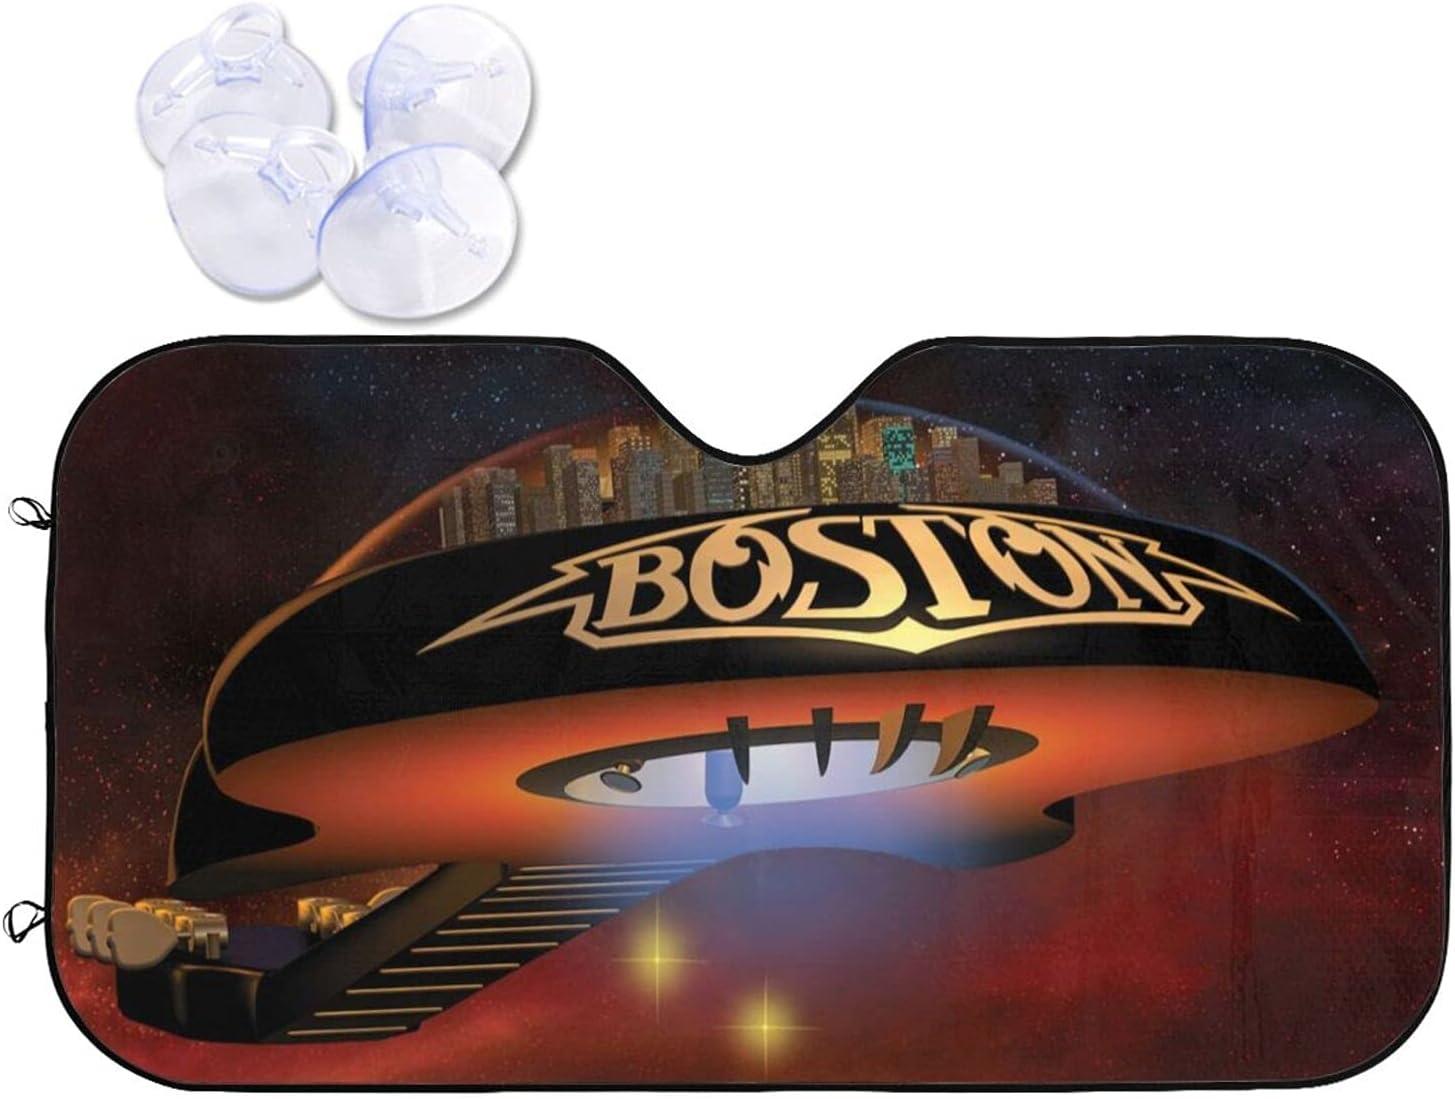 Boston Rock Band Car 2021 new Detroit Mall Sunshade Prevention and Windshield Sun Heat